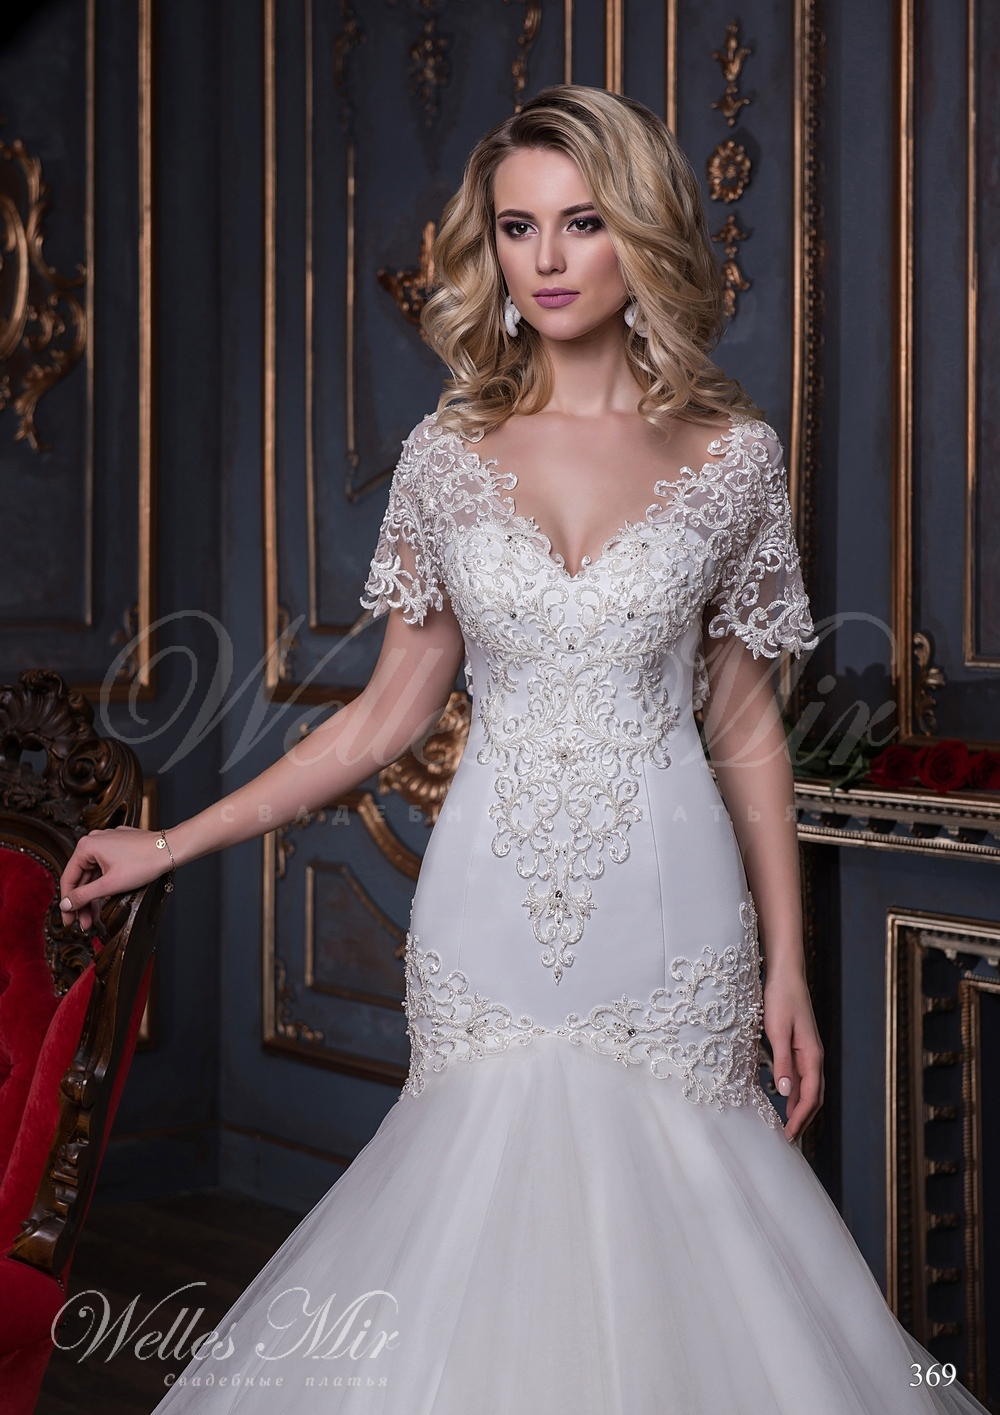 Wedding dresses manufacturers in Ukraine